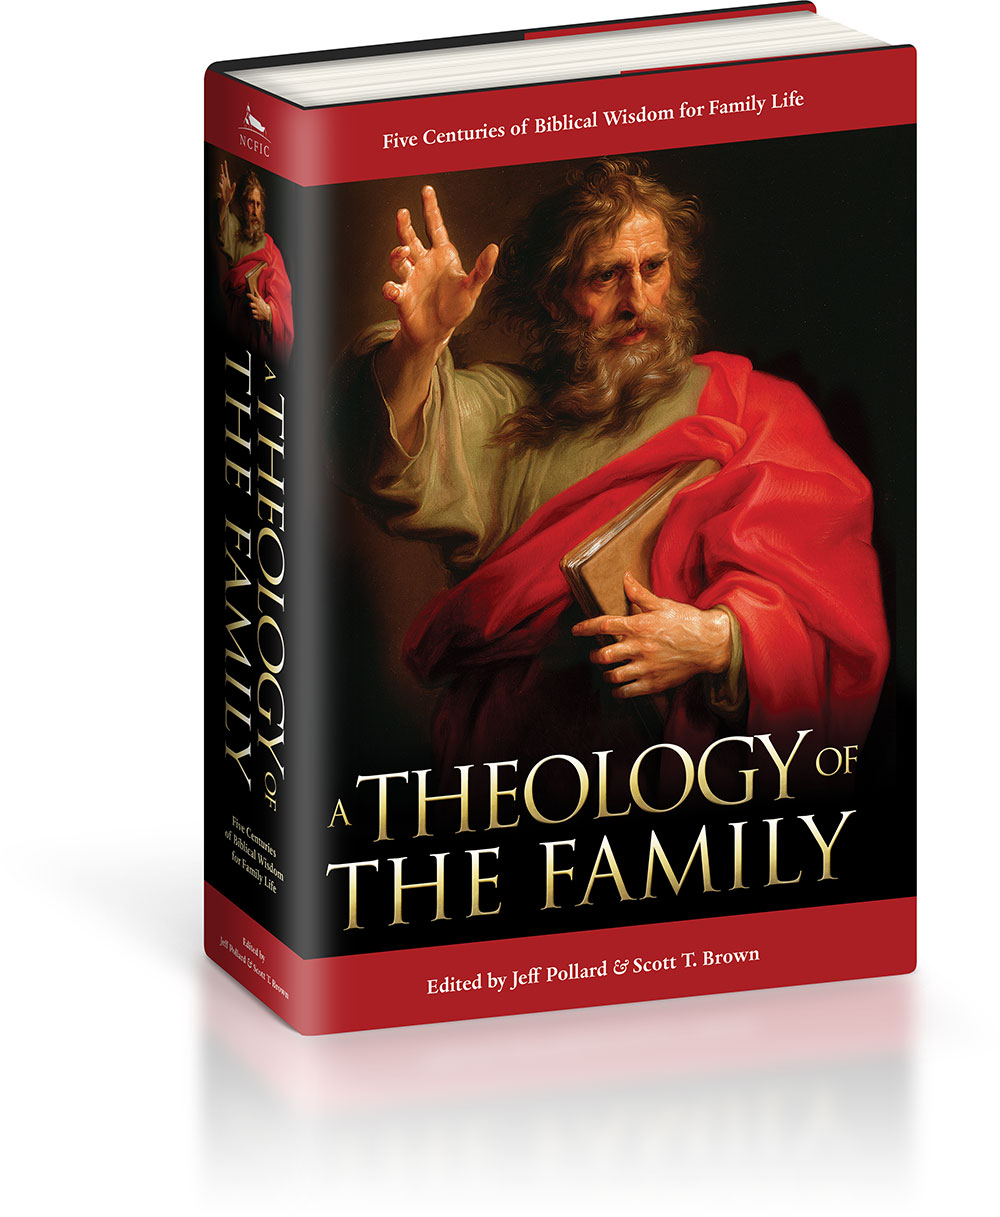 theology-of-the-family-mockup